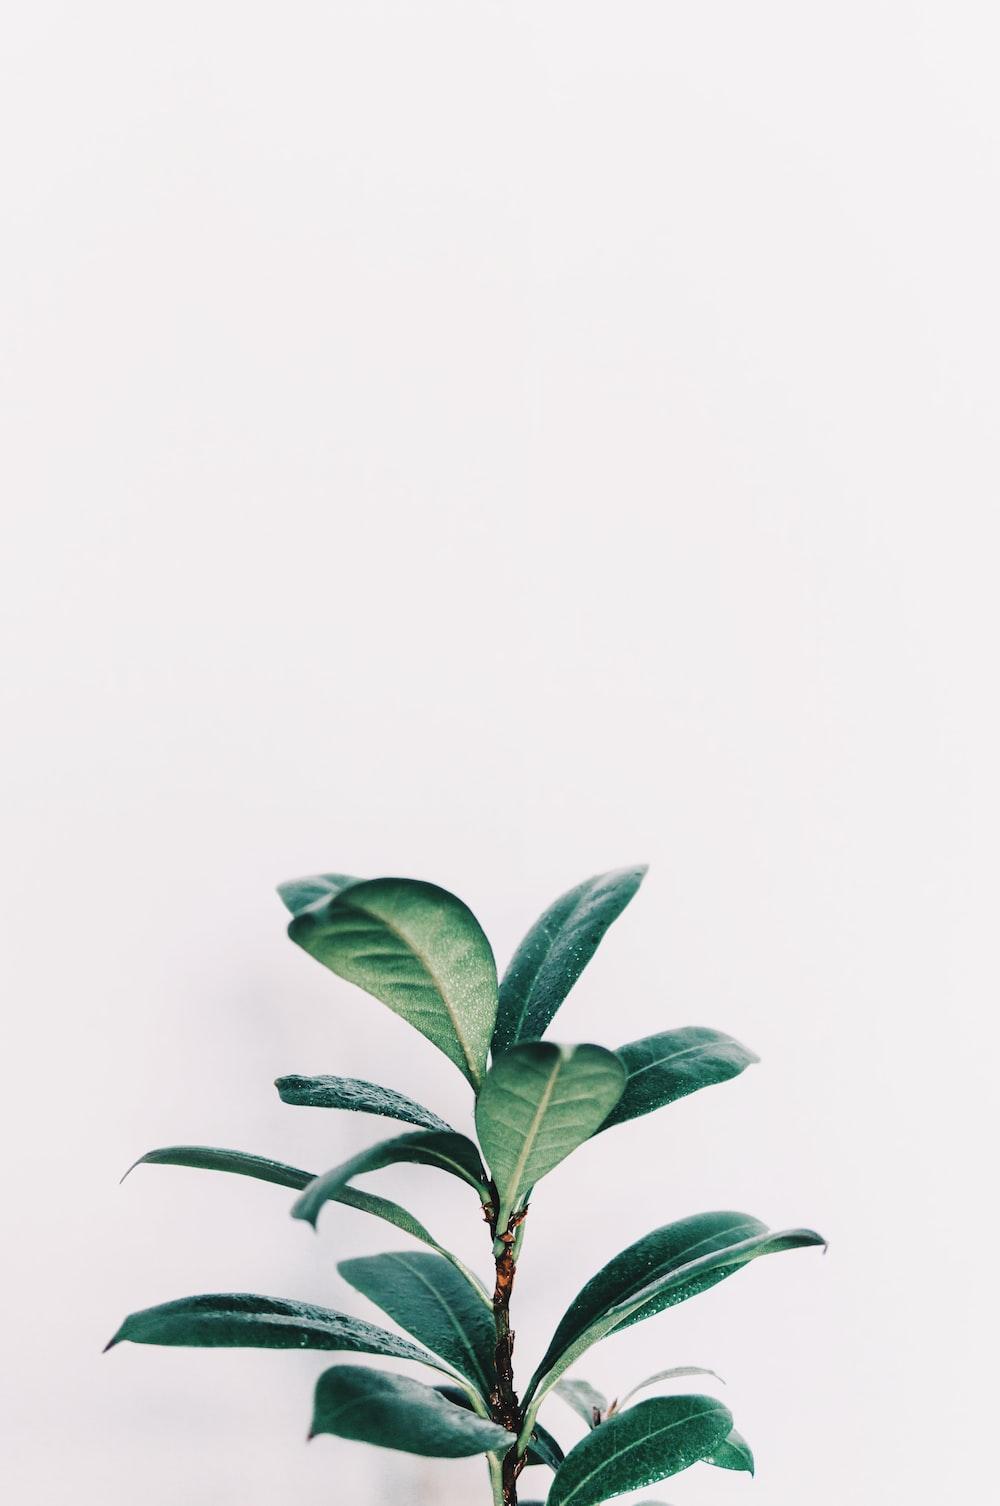 green leafed plant closeup photo